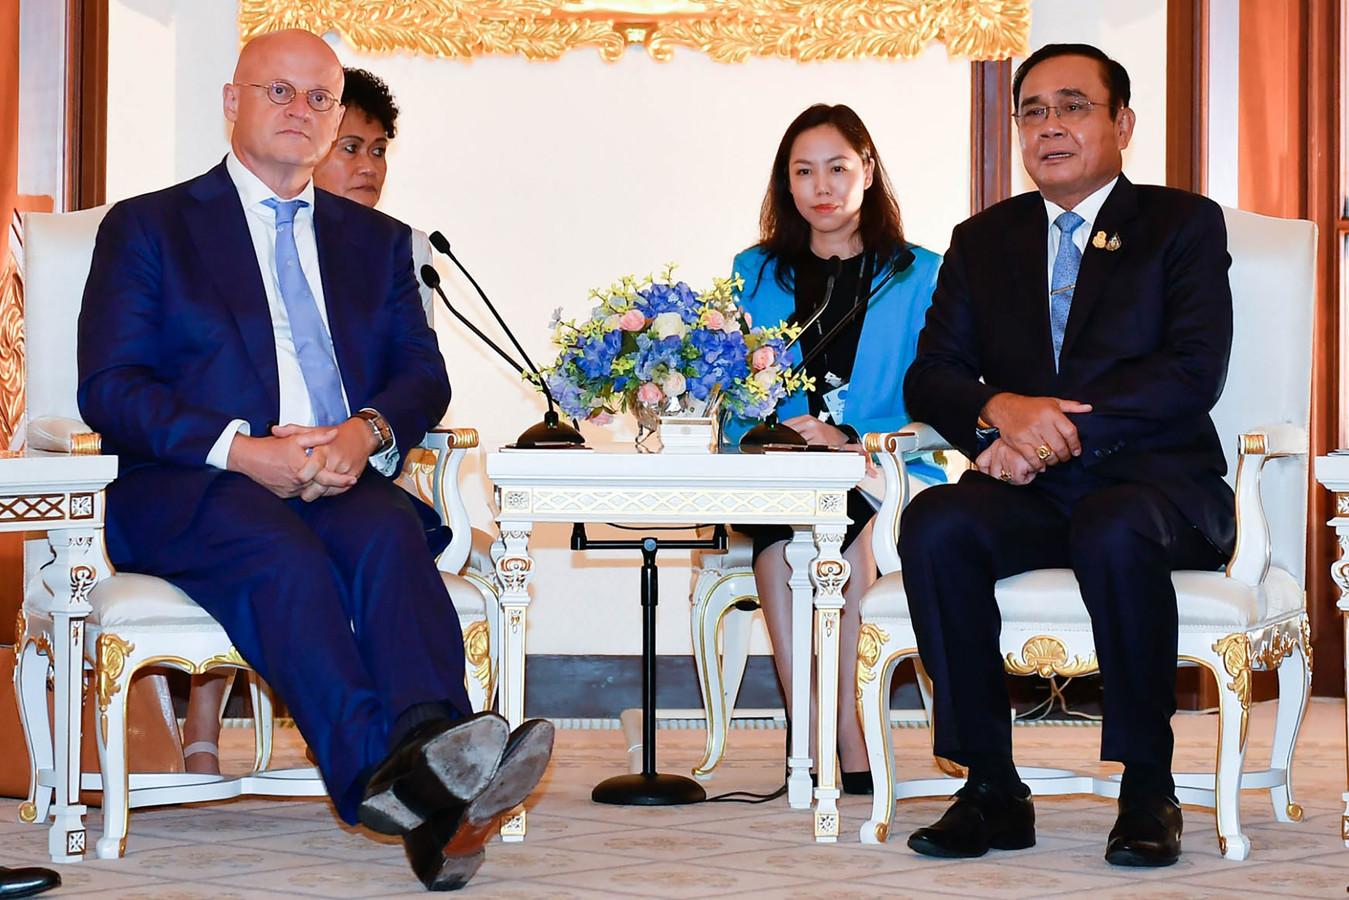 De ontmoeting van minister Grapperhaus met de Thaise premier Prayut Chan-O-Cha